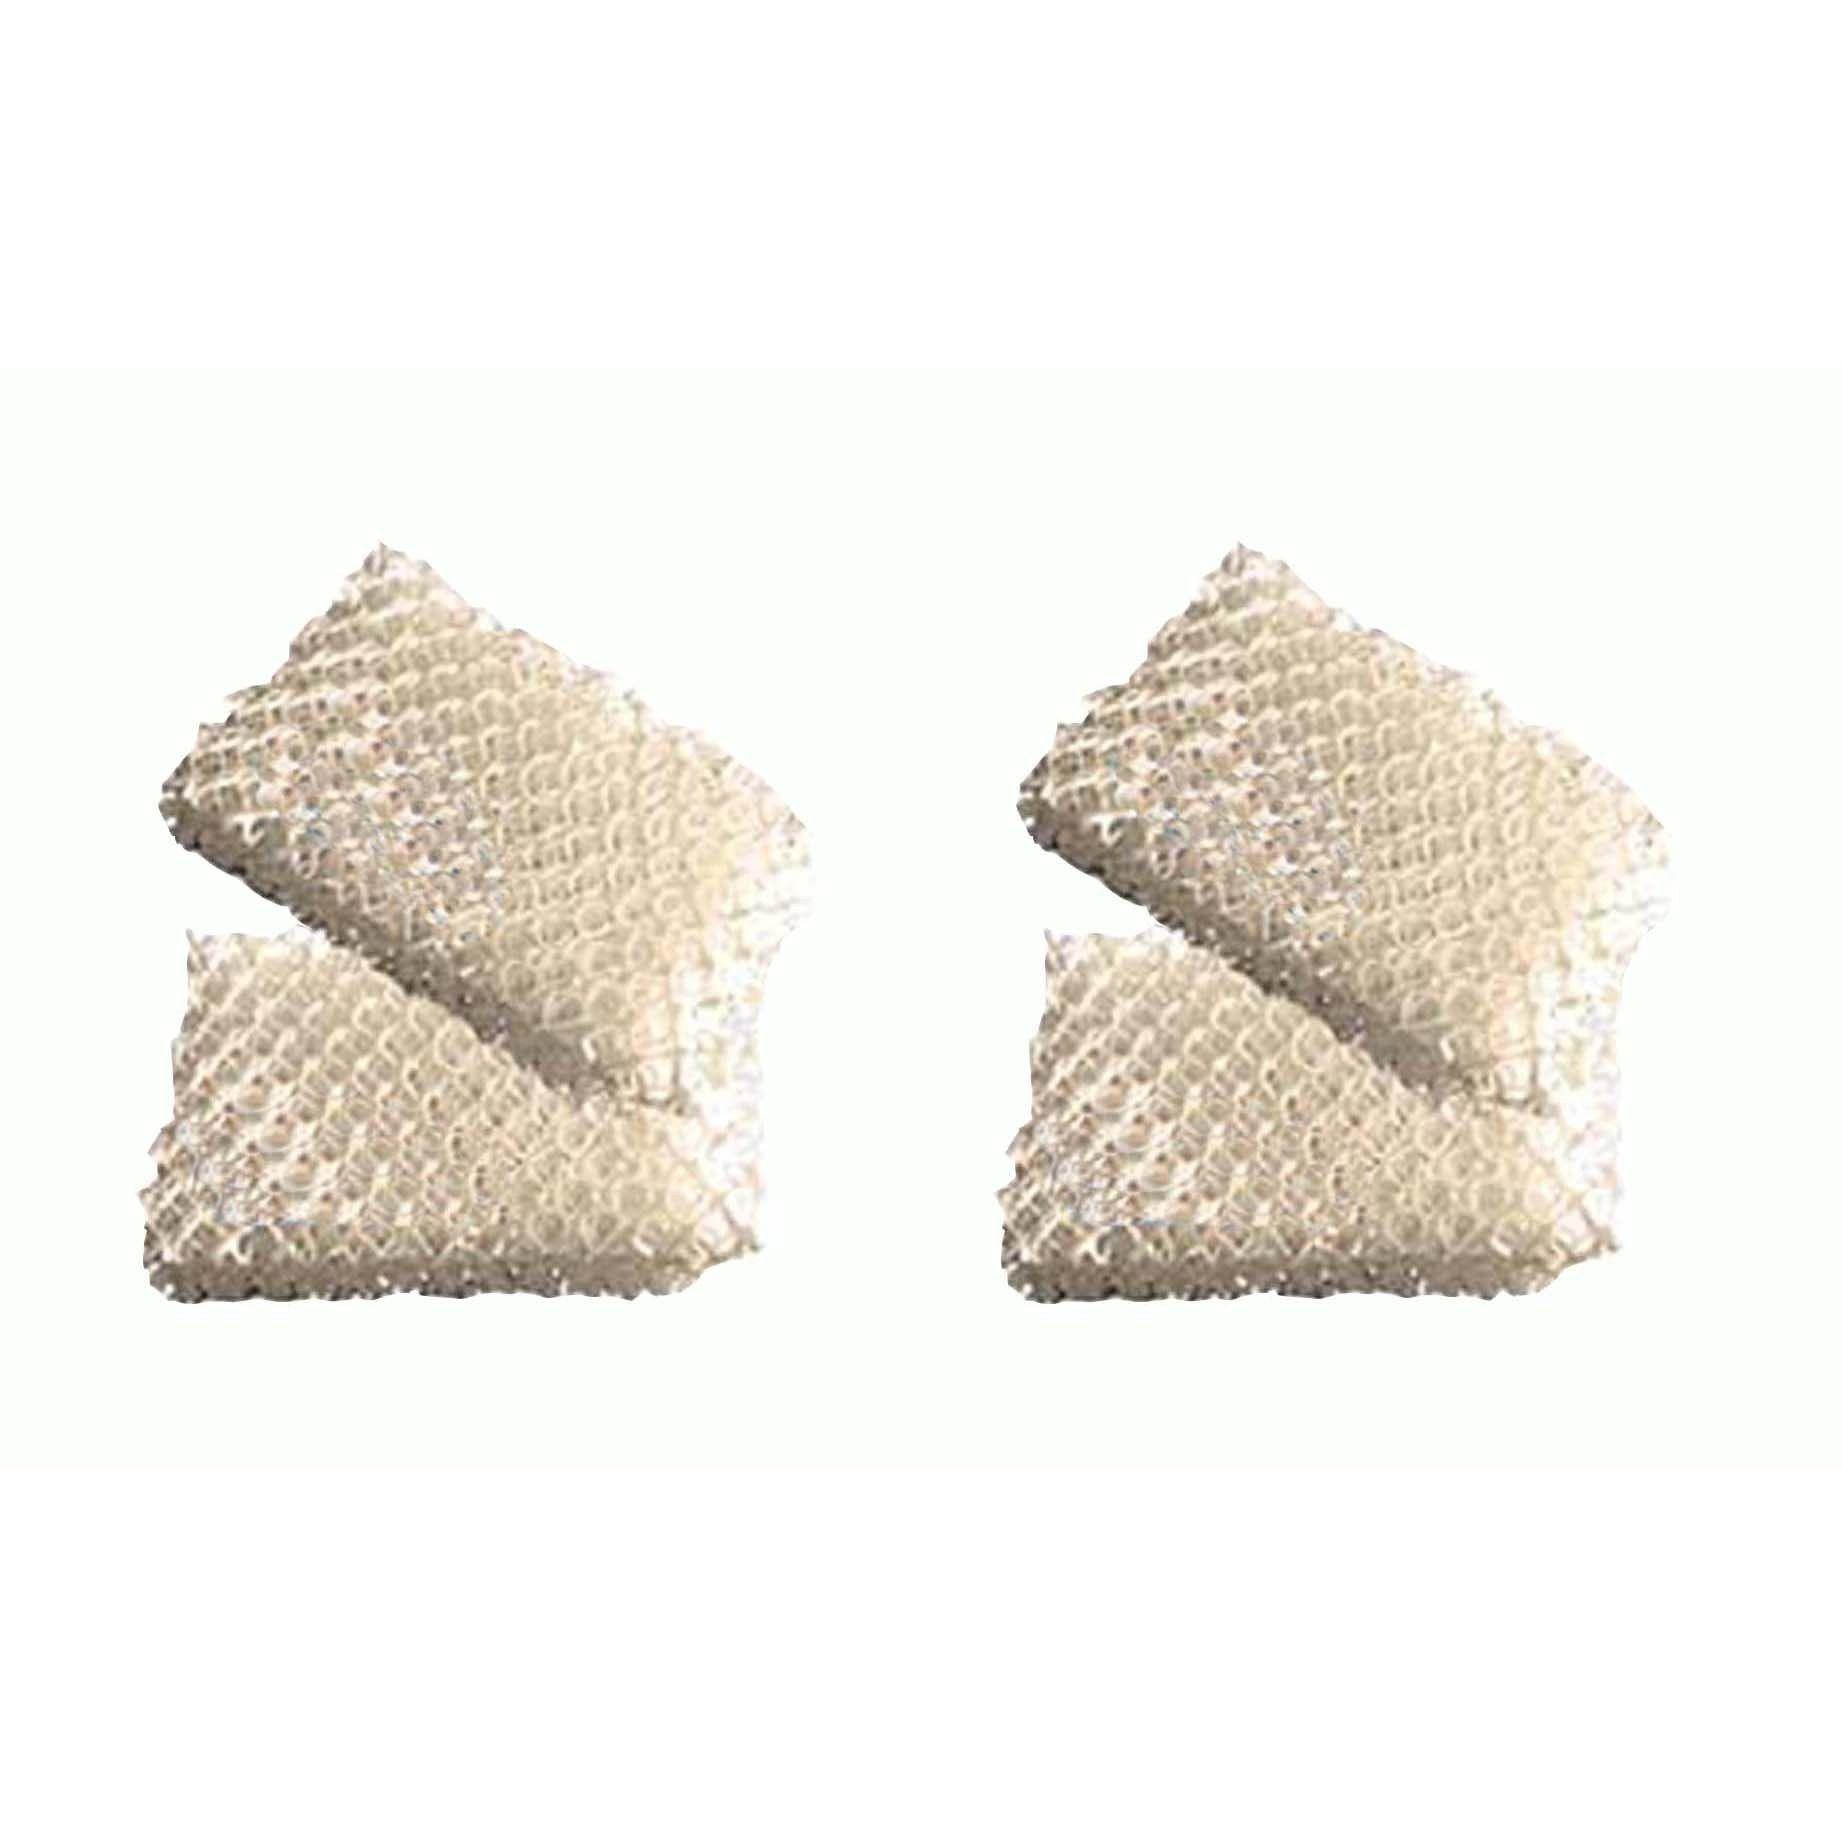 4 Honeywell Humidifier Wick Filters HCM-525, Part # AC813, D13C, D13